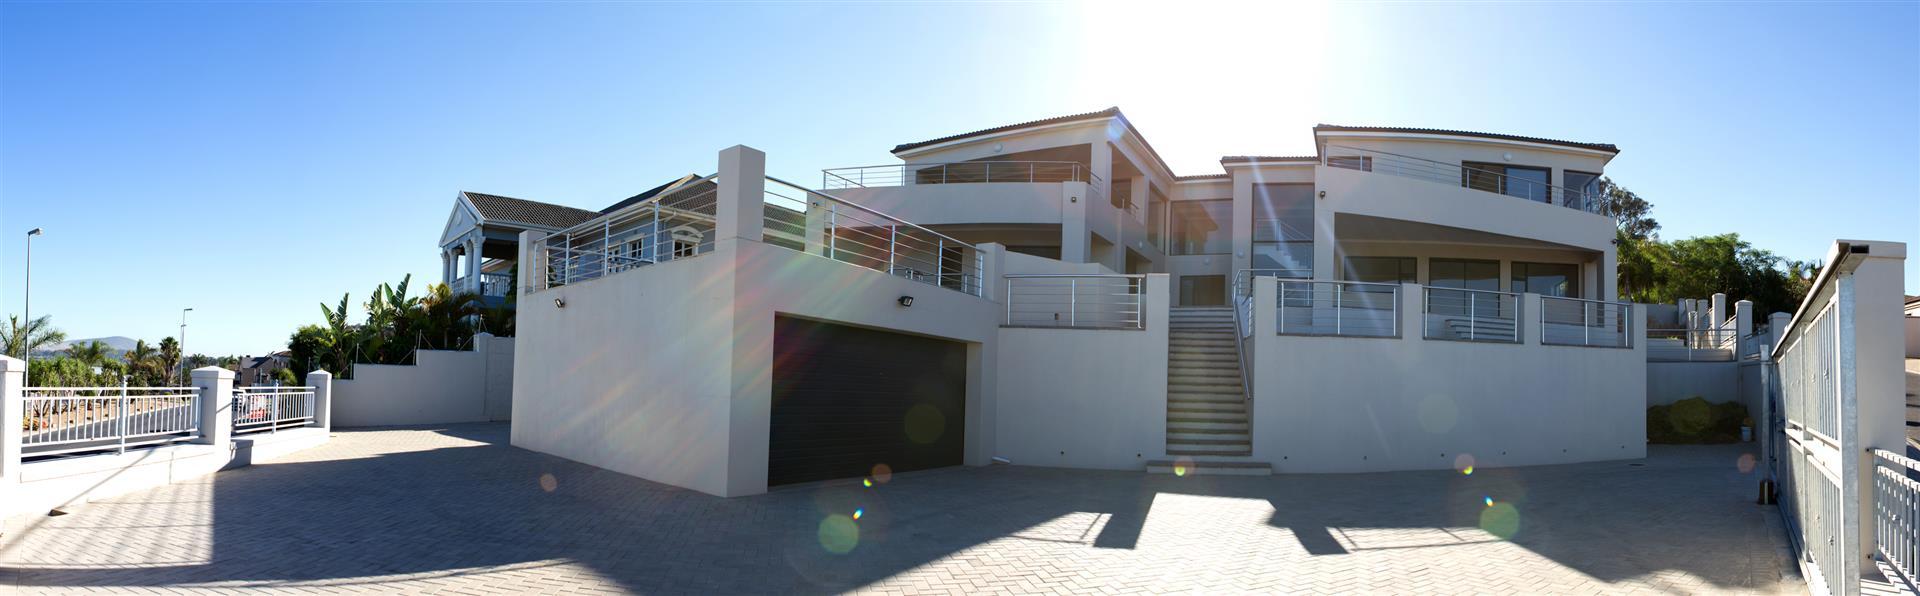 Verdi Boulevard, Sonstraal Heights, Durbanville